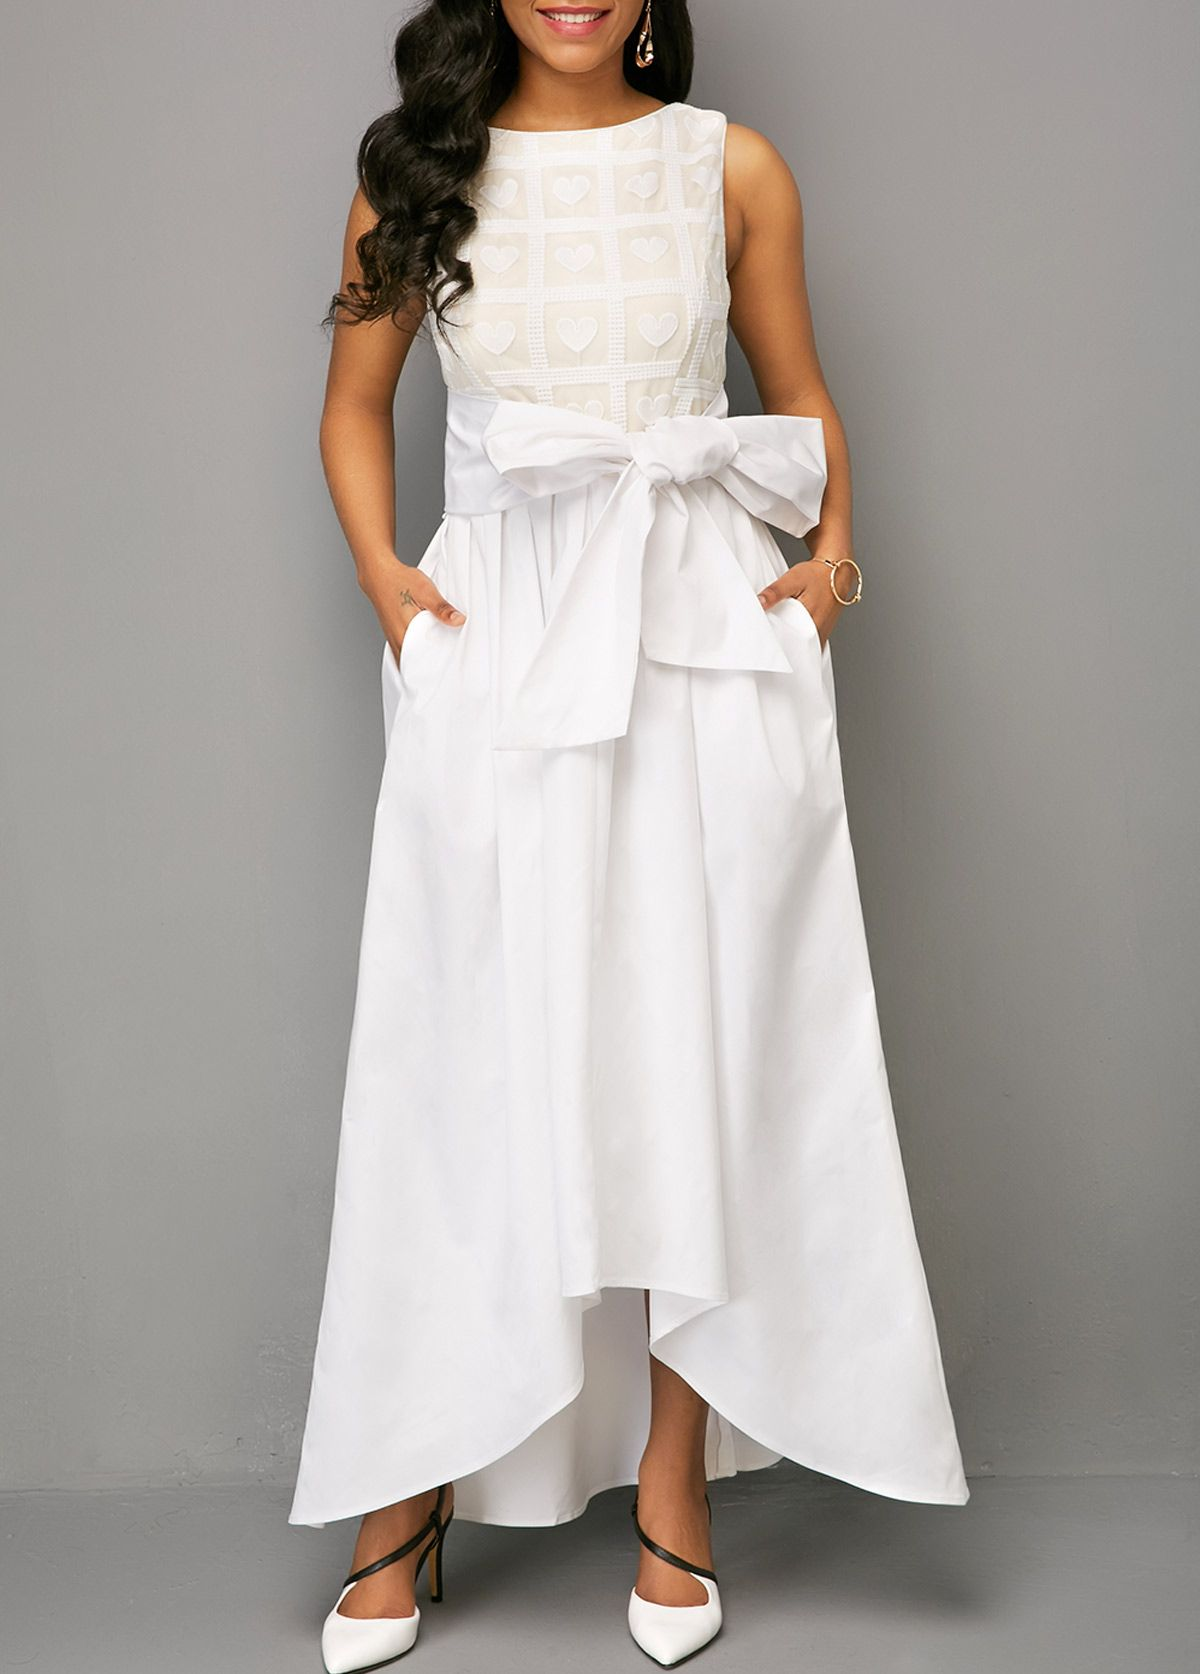 Pin by veta on maxi dress in pinterest white maxi dresses